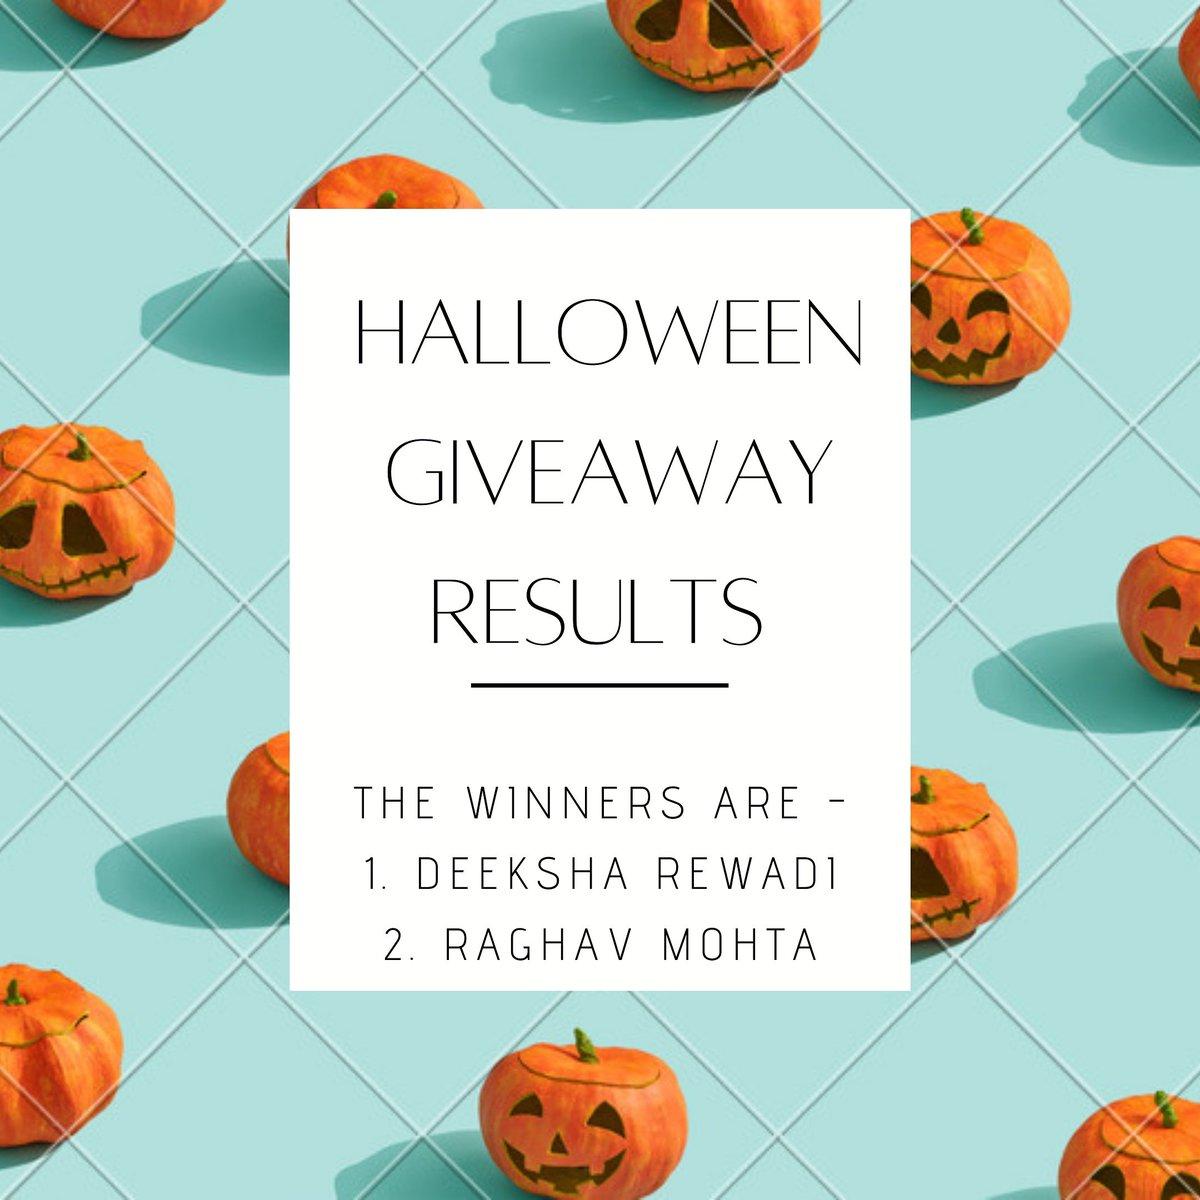 The most awaited Halloween Giveaway Results are here!!!🎃❤️ The winners of this giveaway are: 1. Deeksha Rewadi 2. Raghav Mohta  Please contact us. . . . . #hazel__hut #selflove #selfcare #halloween2020 #halloweengiveaway #handmadewithlove #organic #skincare #bathandbeauty #bath https://t.co/5NhYPadnvZ